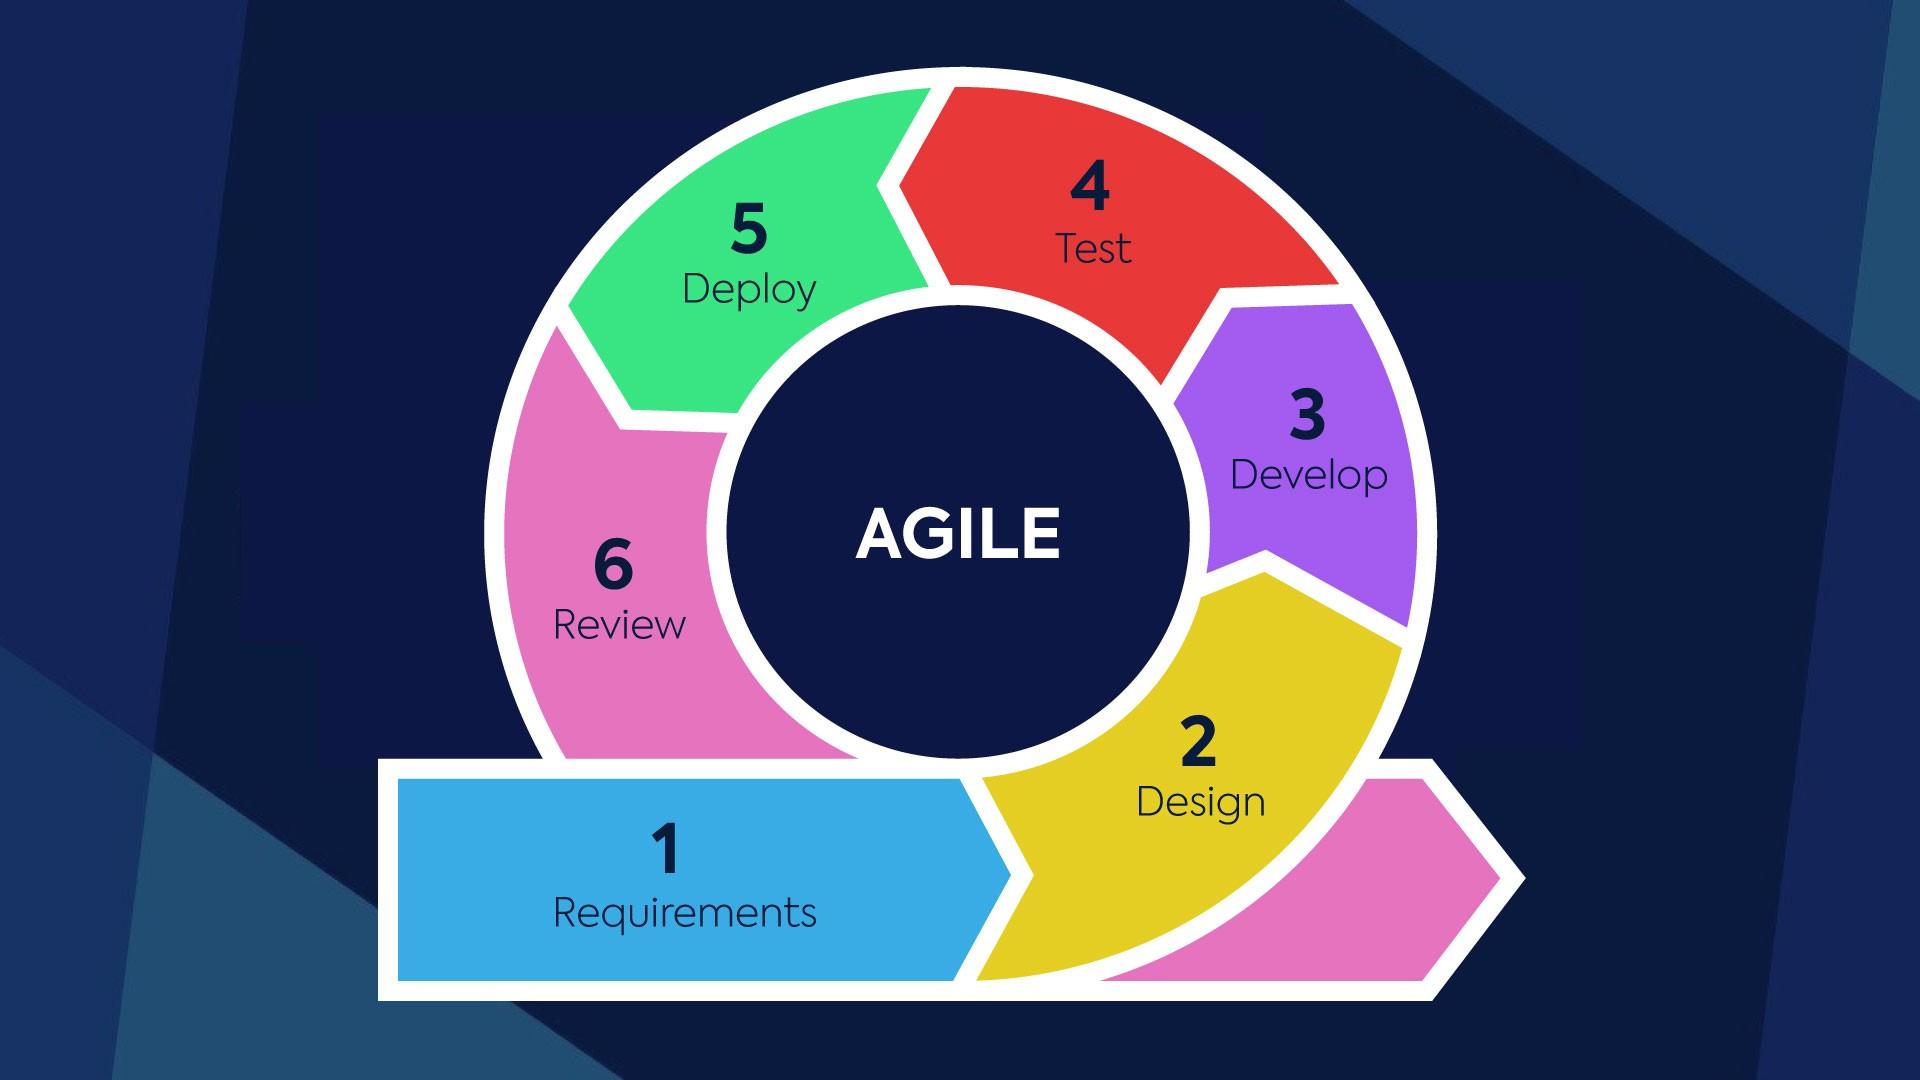 Agile Project Flow Netsells